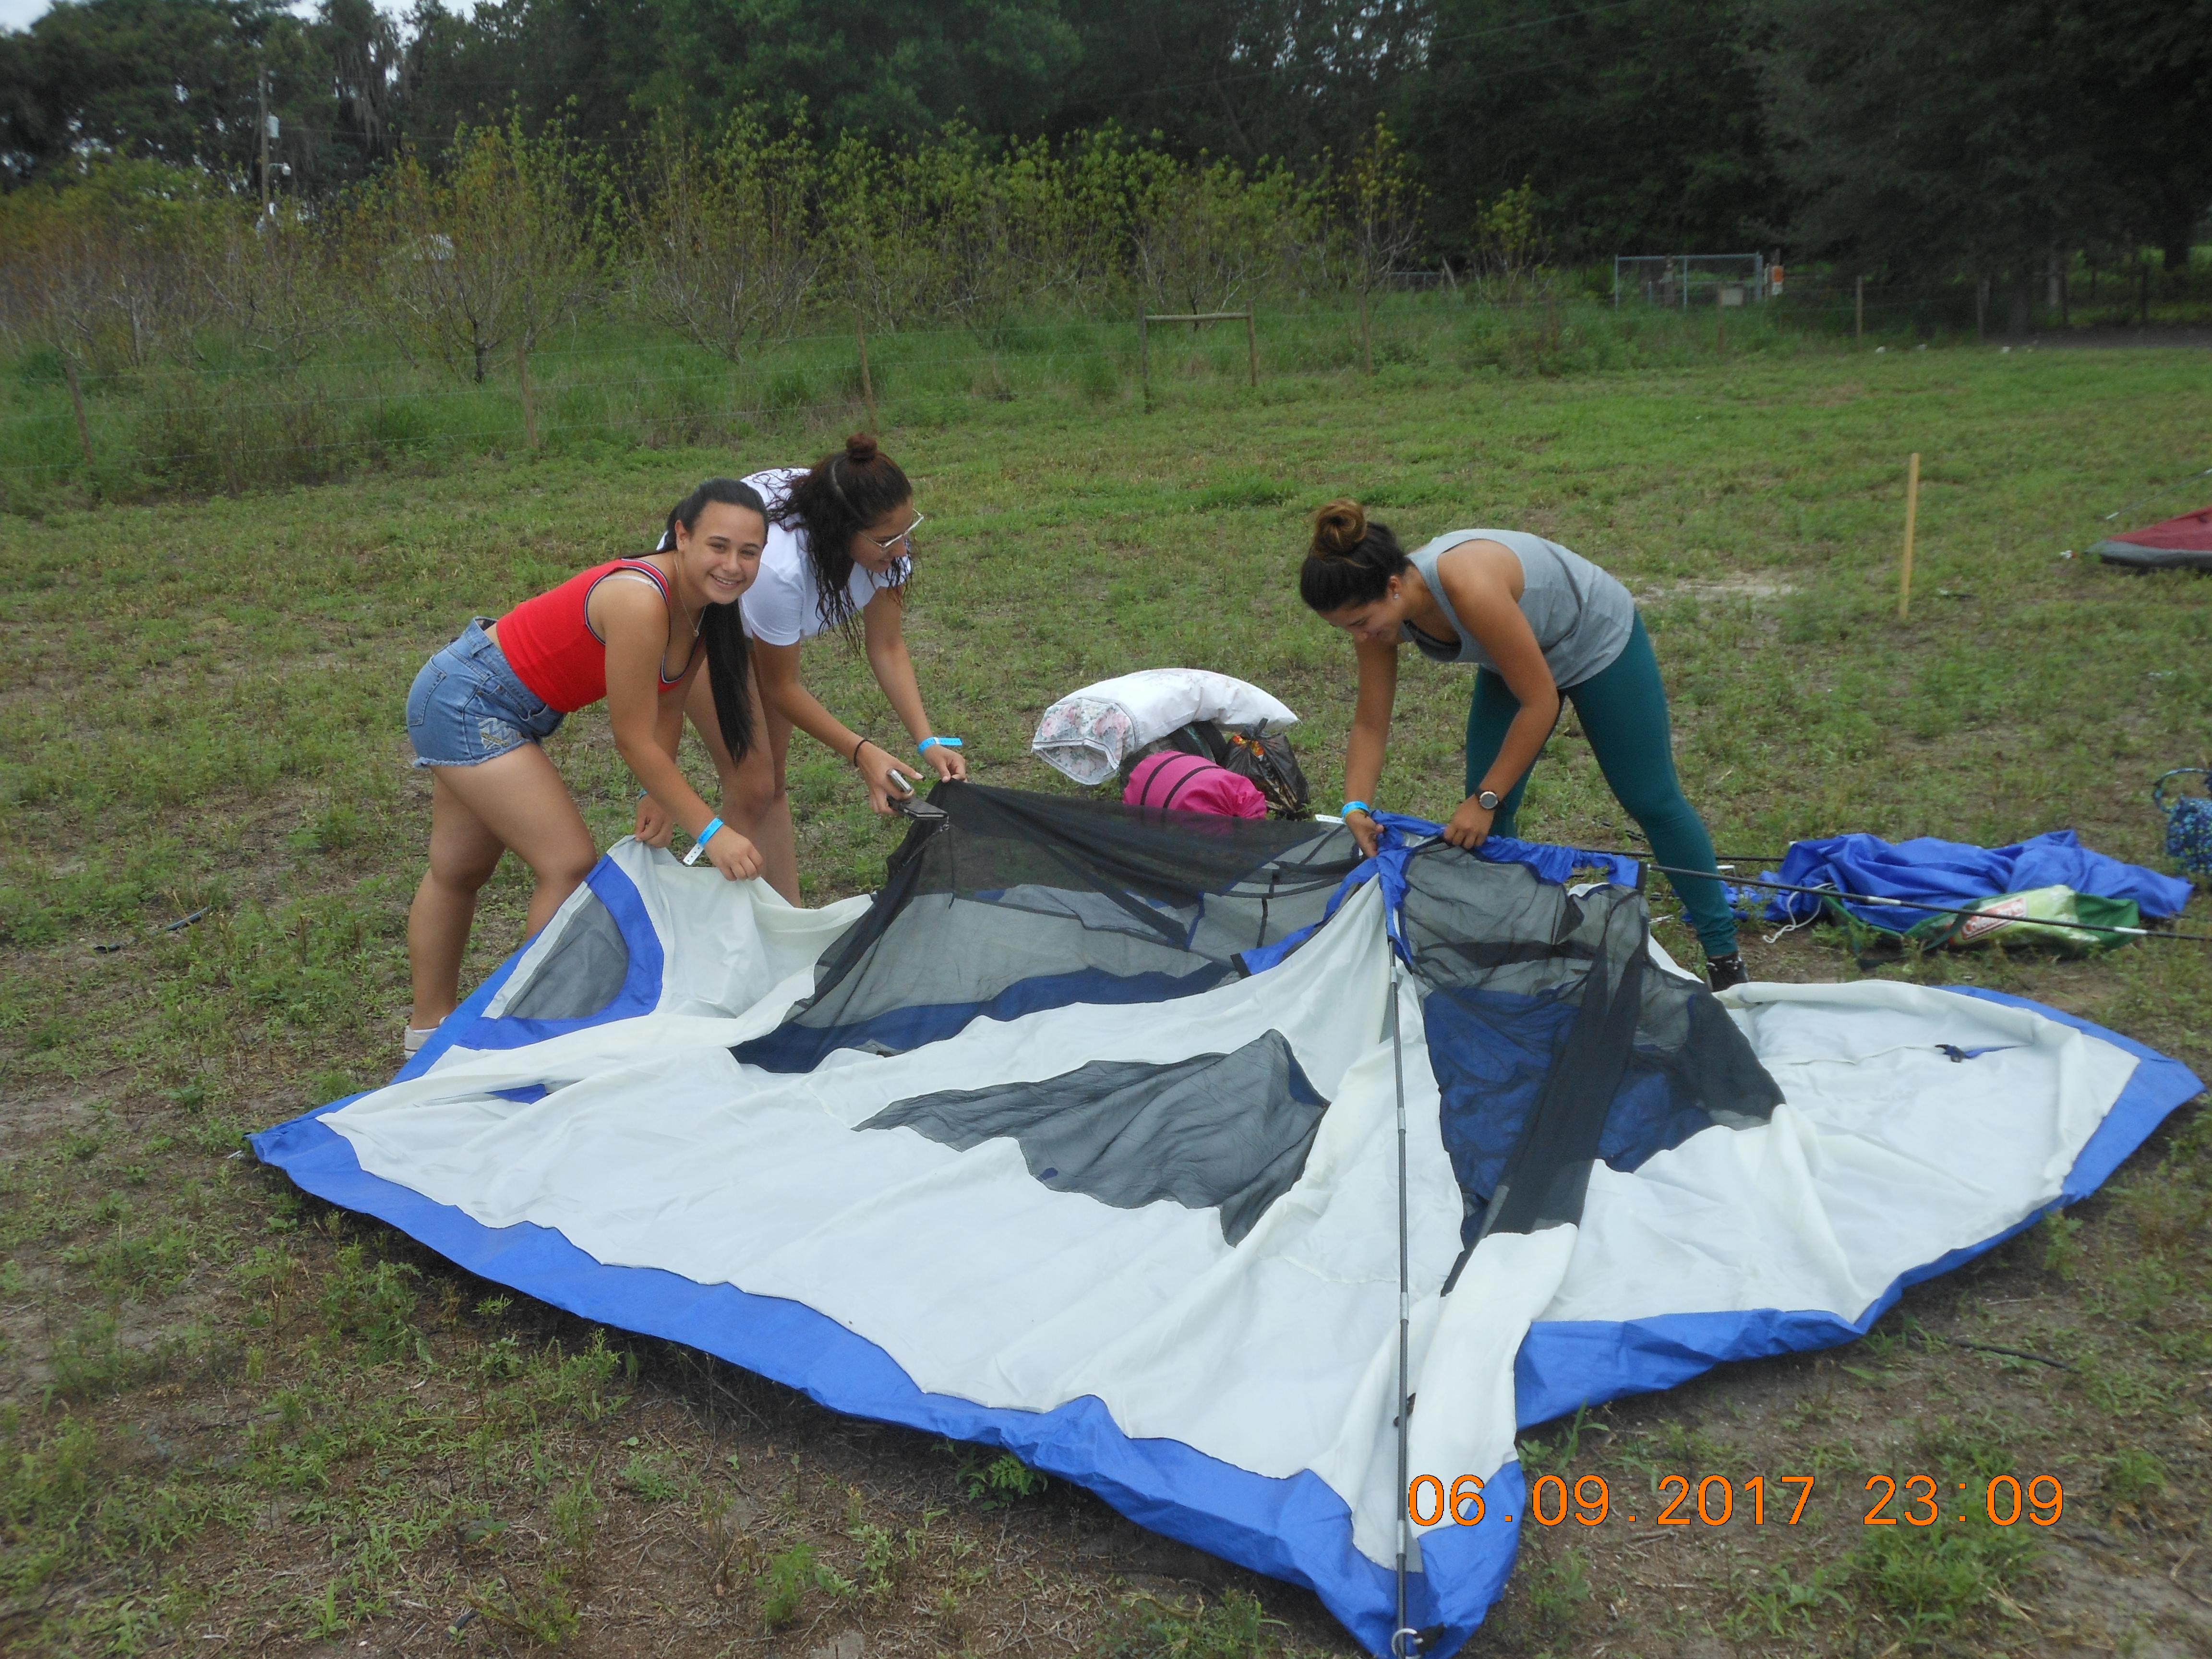 Dscn2835 Tent Pitching Black Reins